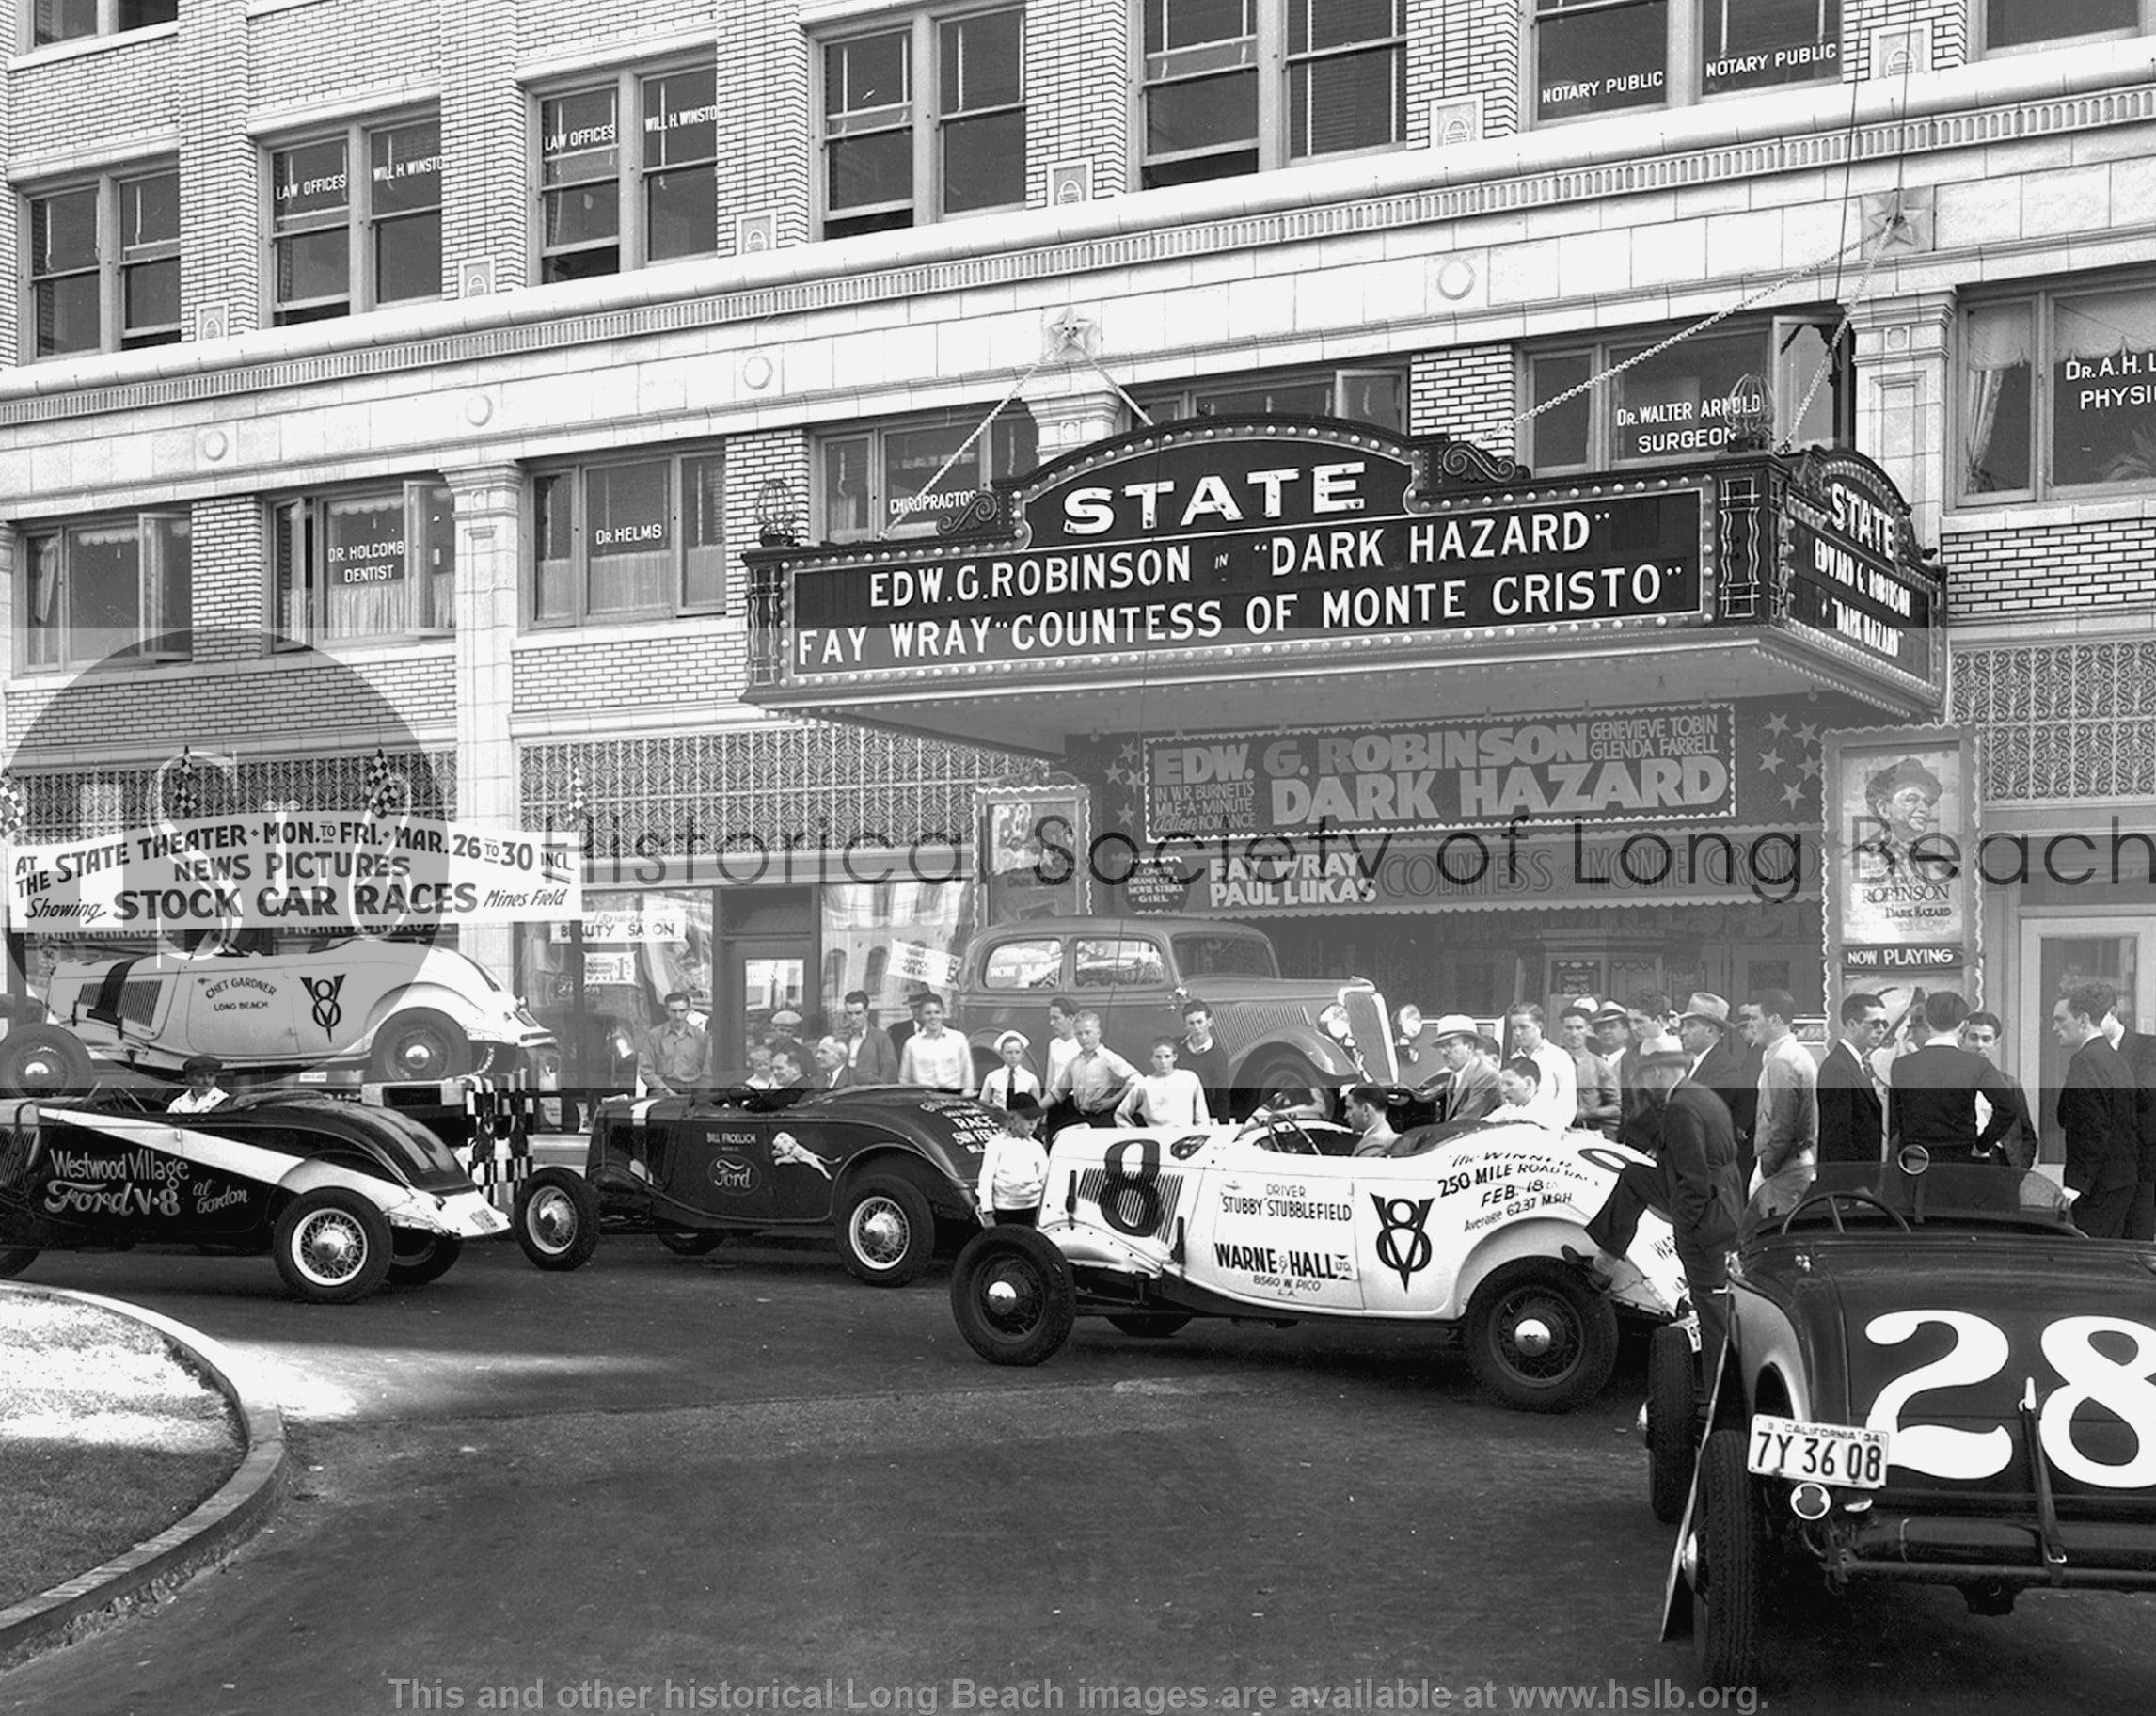 Autos at State Theatre, 1934 vintage photograph